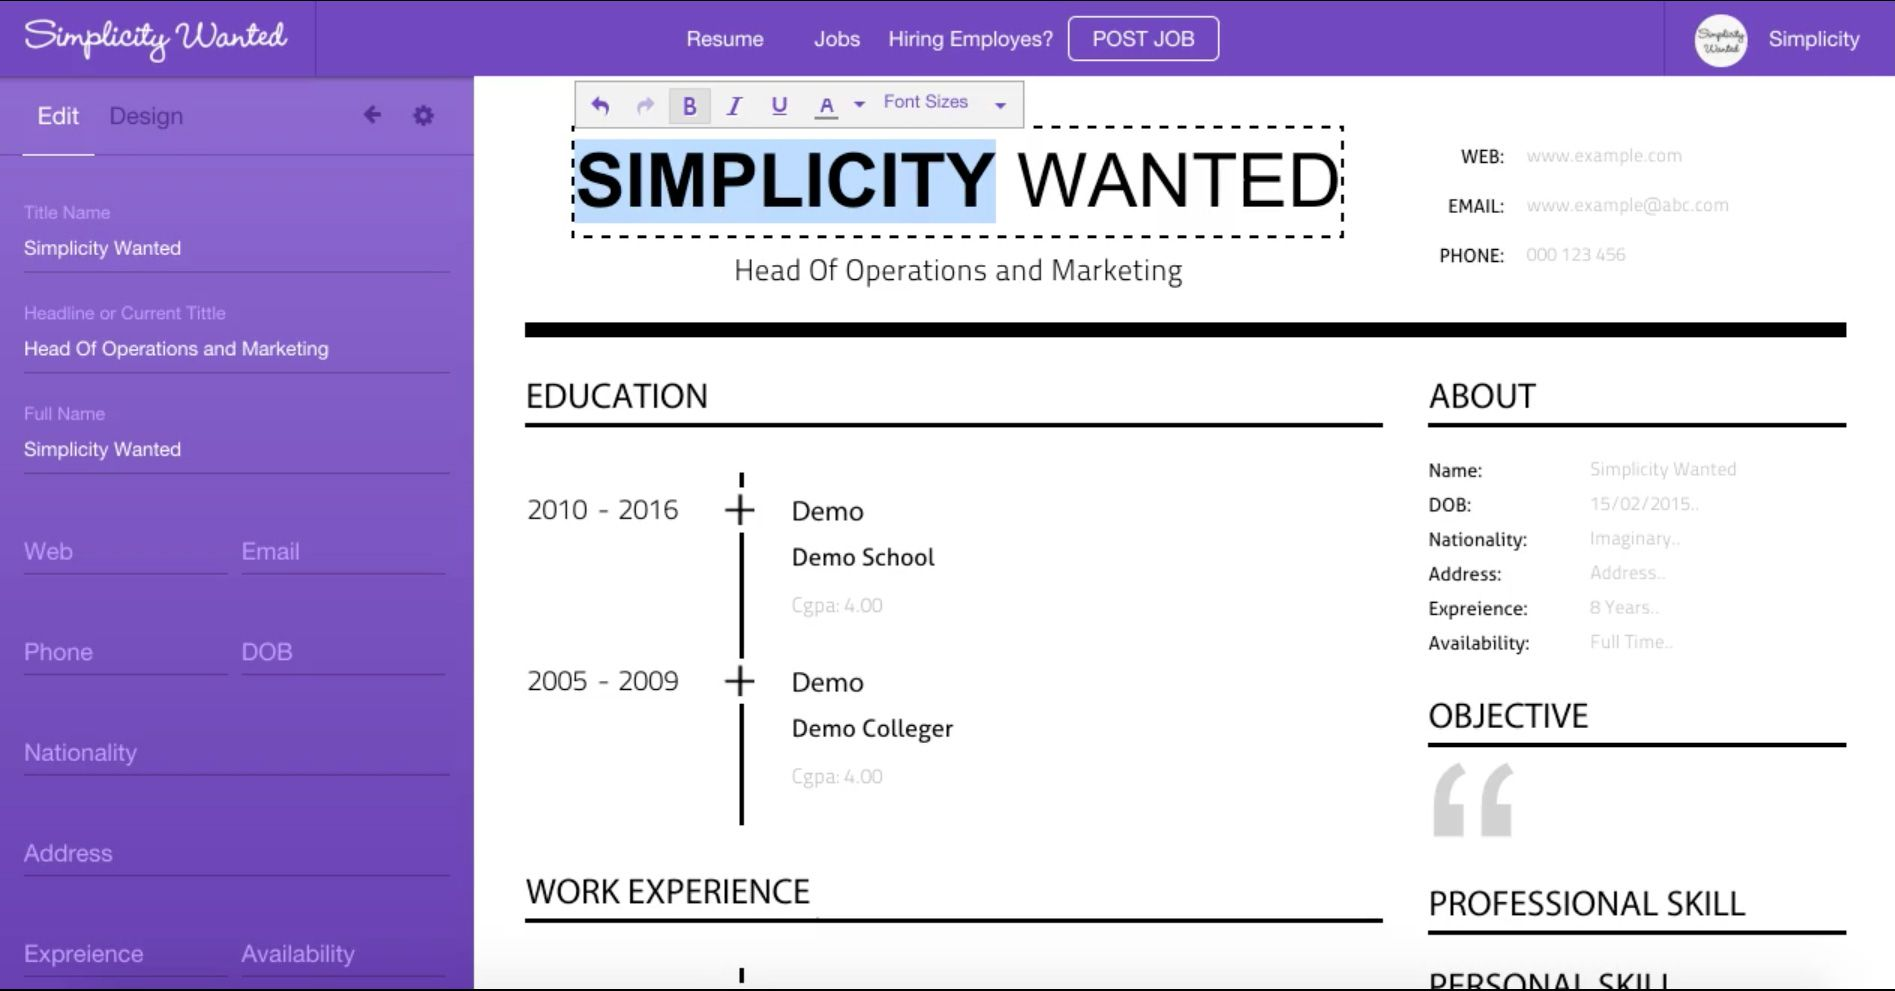 resume builder free online download in 2020 Resume cover